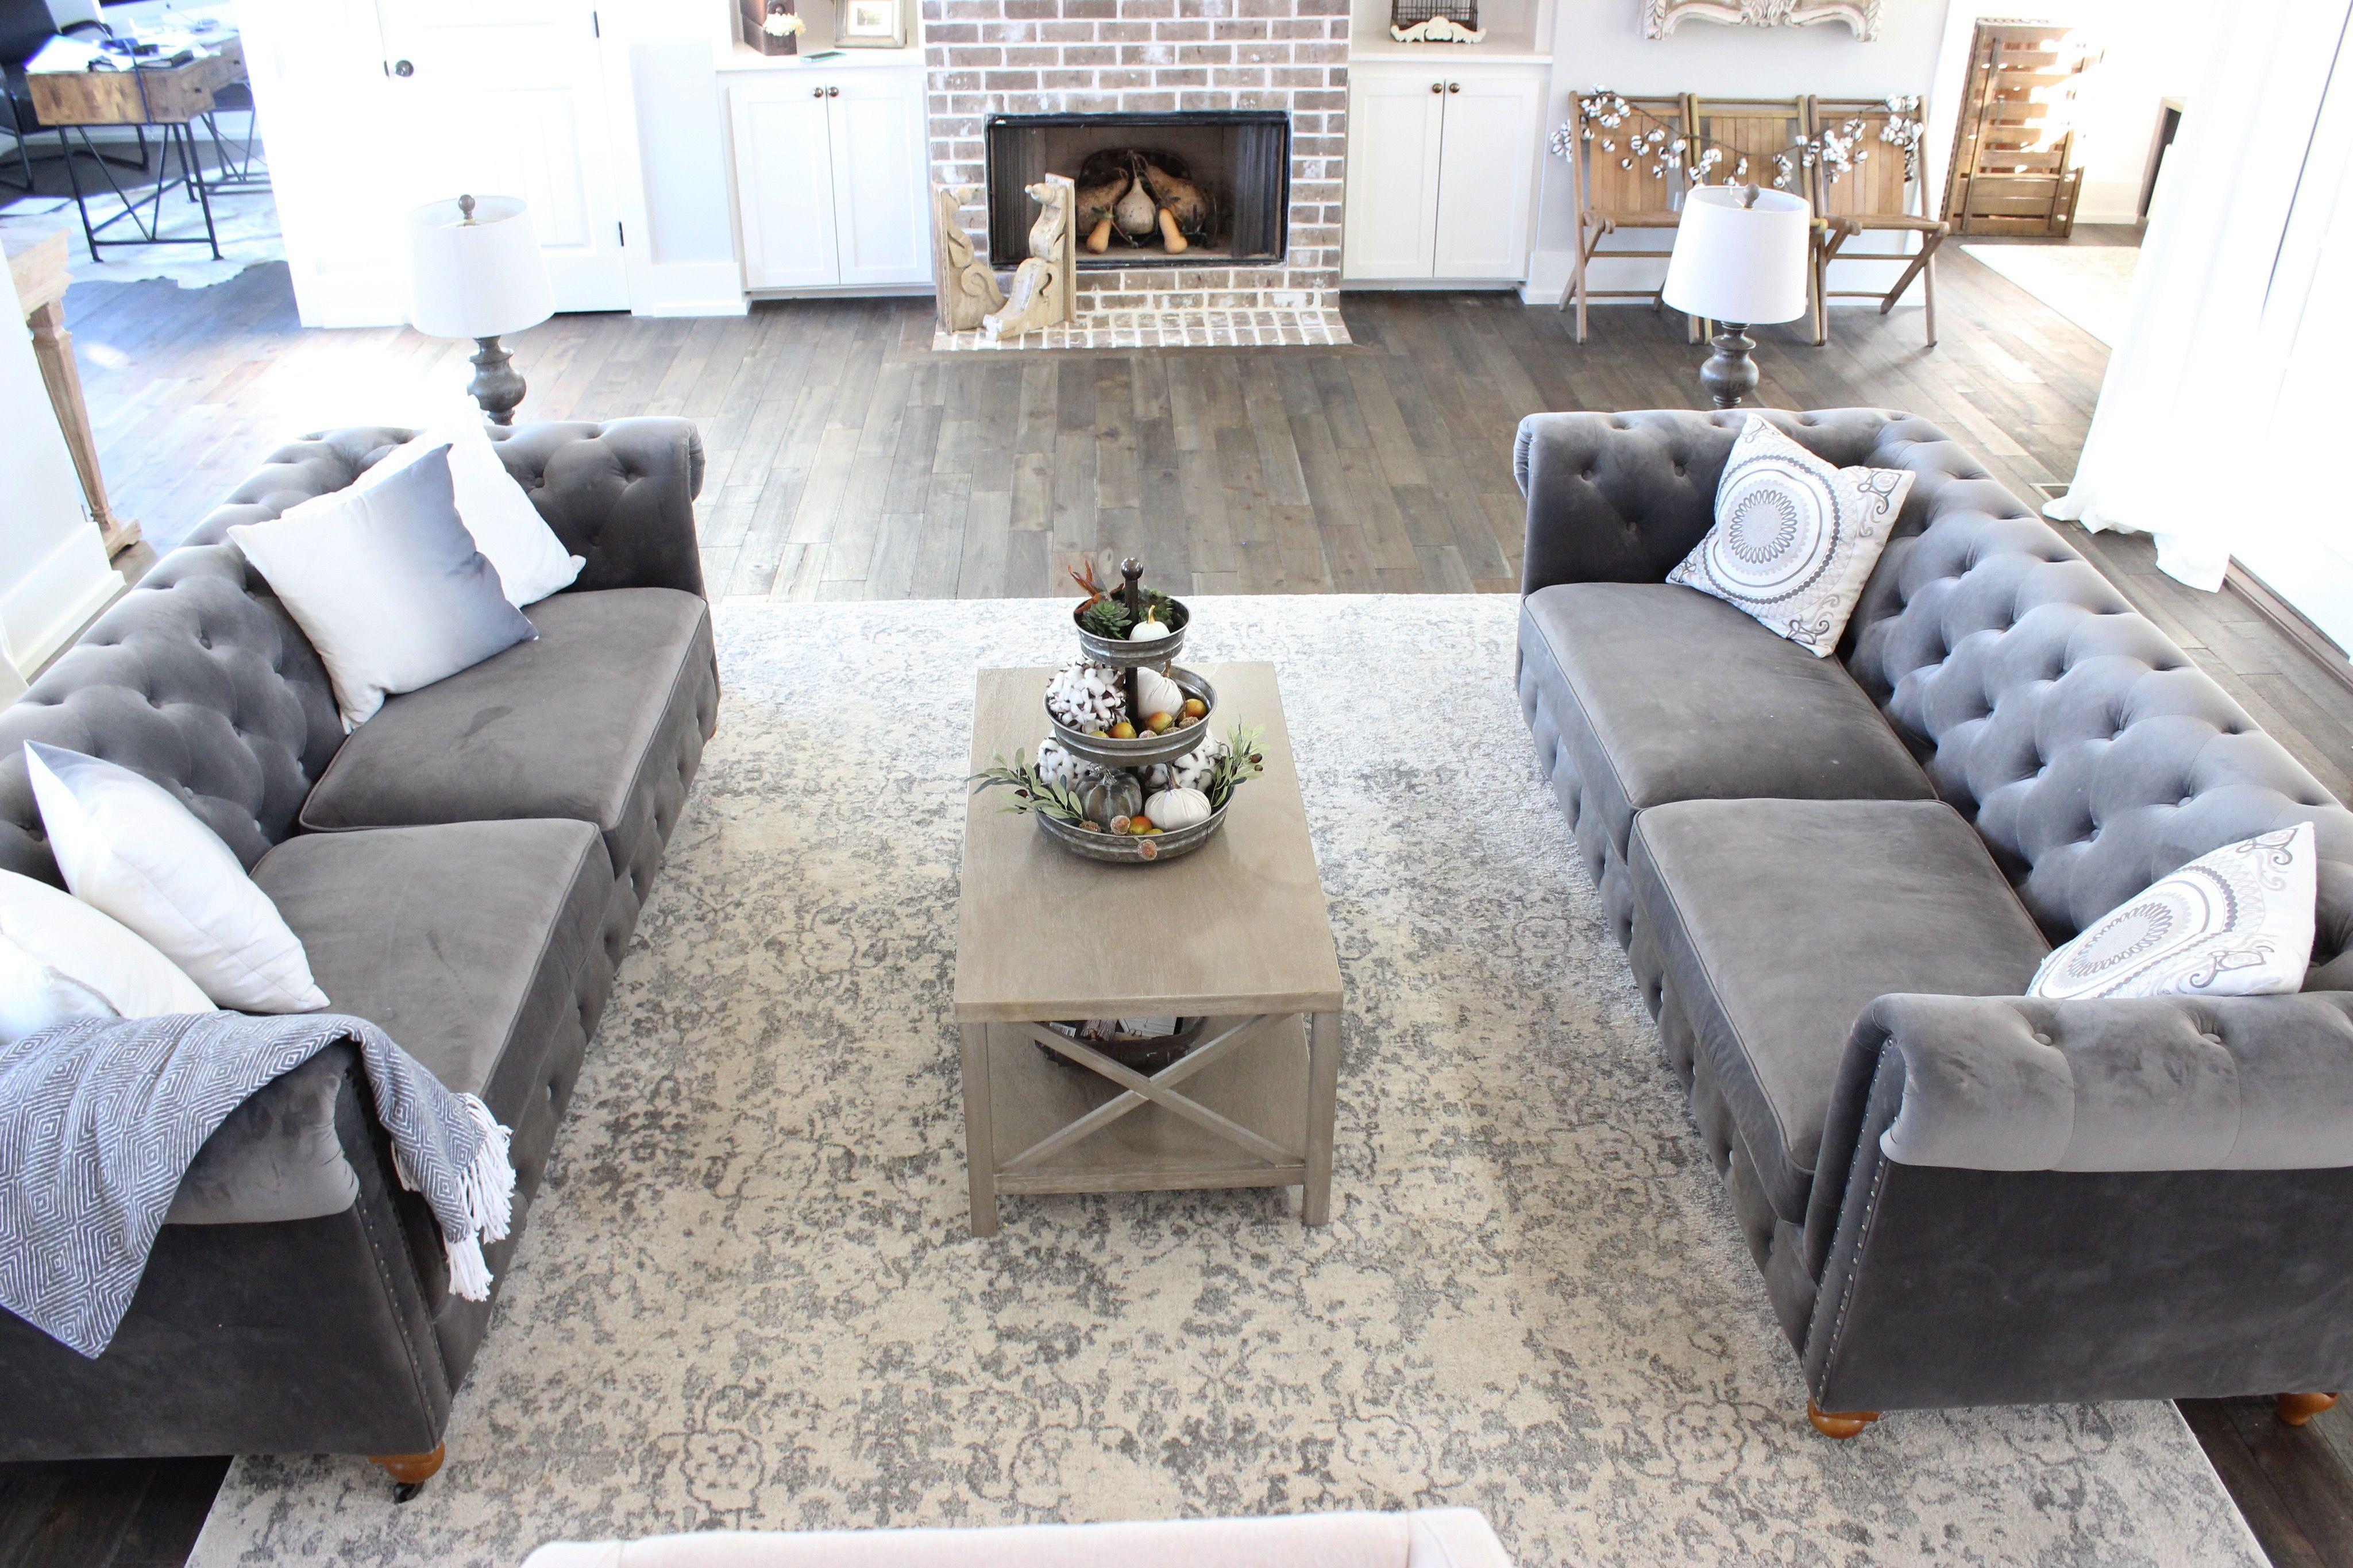 Farmhouse Living Room, Living Room | Tufted Sofa Living Room, Tufted Couch Living Room, Velvet Couch Living Room